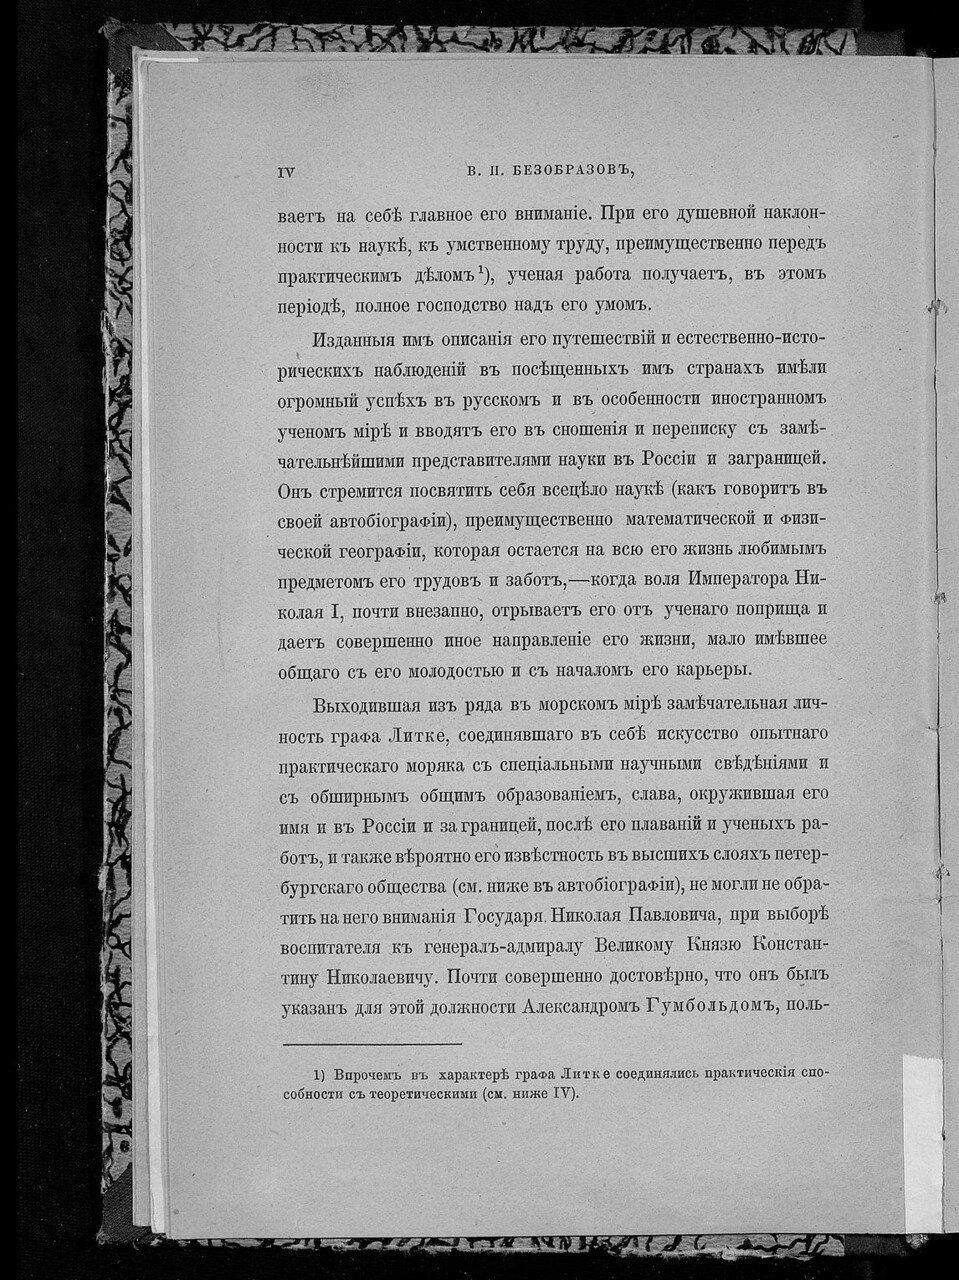 https://img-fotki.yandex.ru/get/373867/199368979.d2/0_21dd56_dcc5f5f1_XXXL.jpg